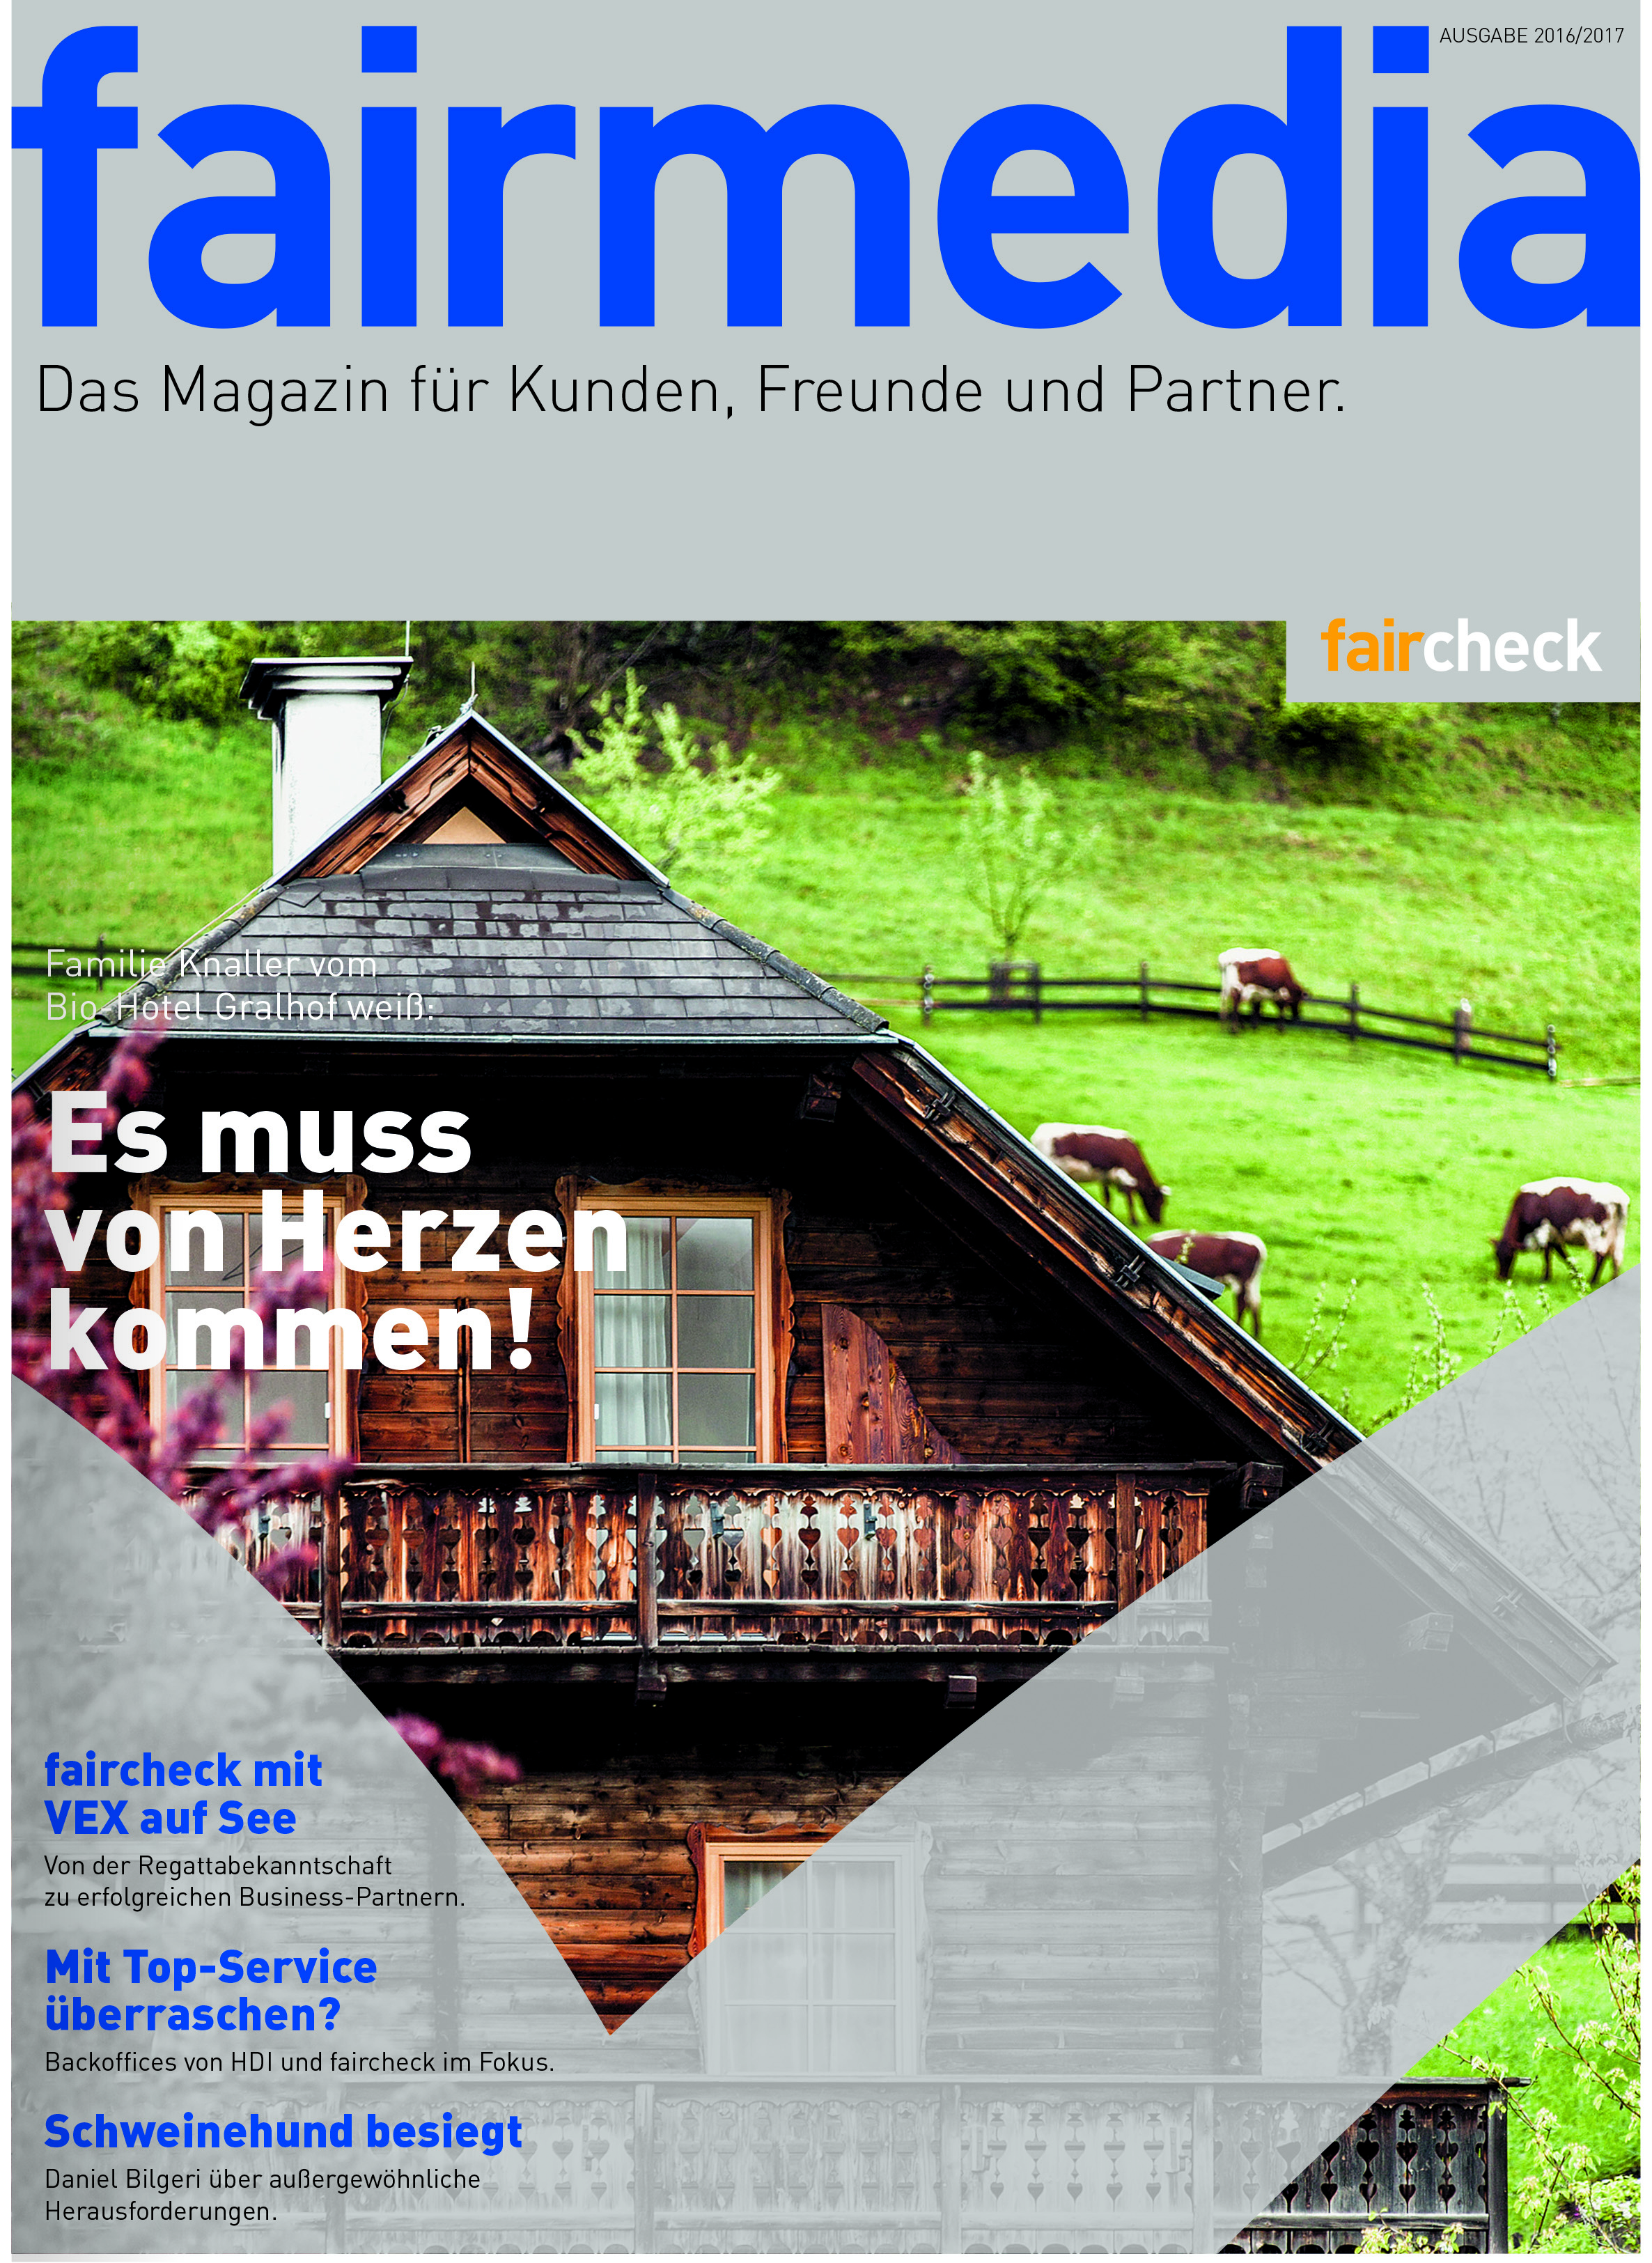 fairmedia - Kundenmagazin faircheck